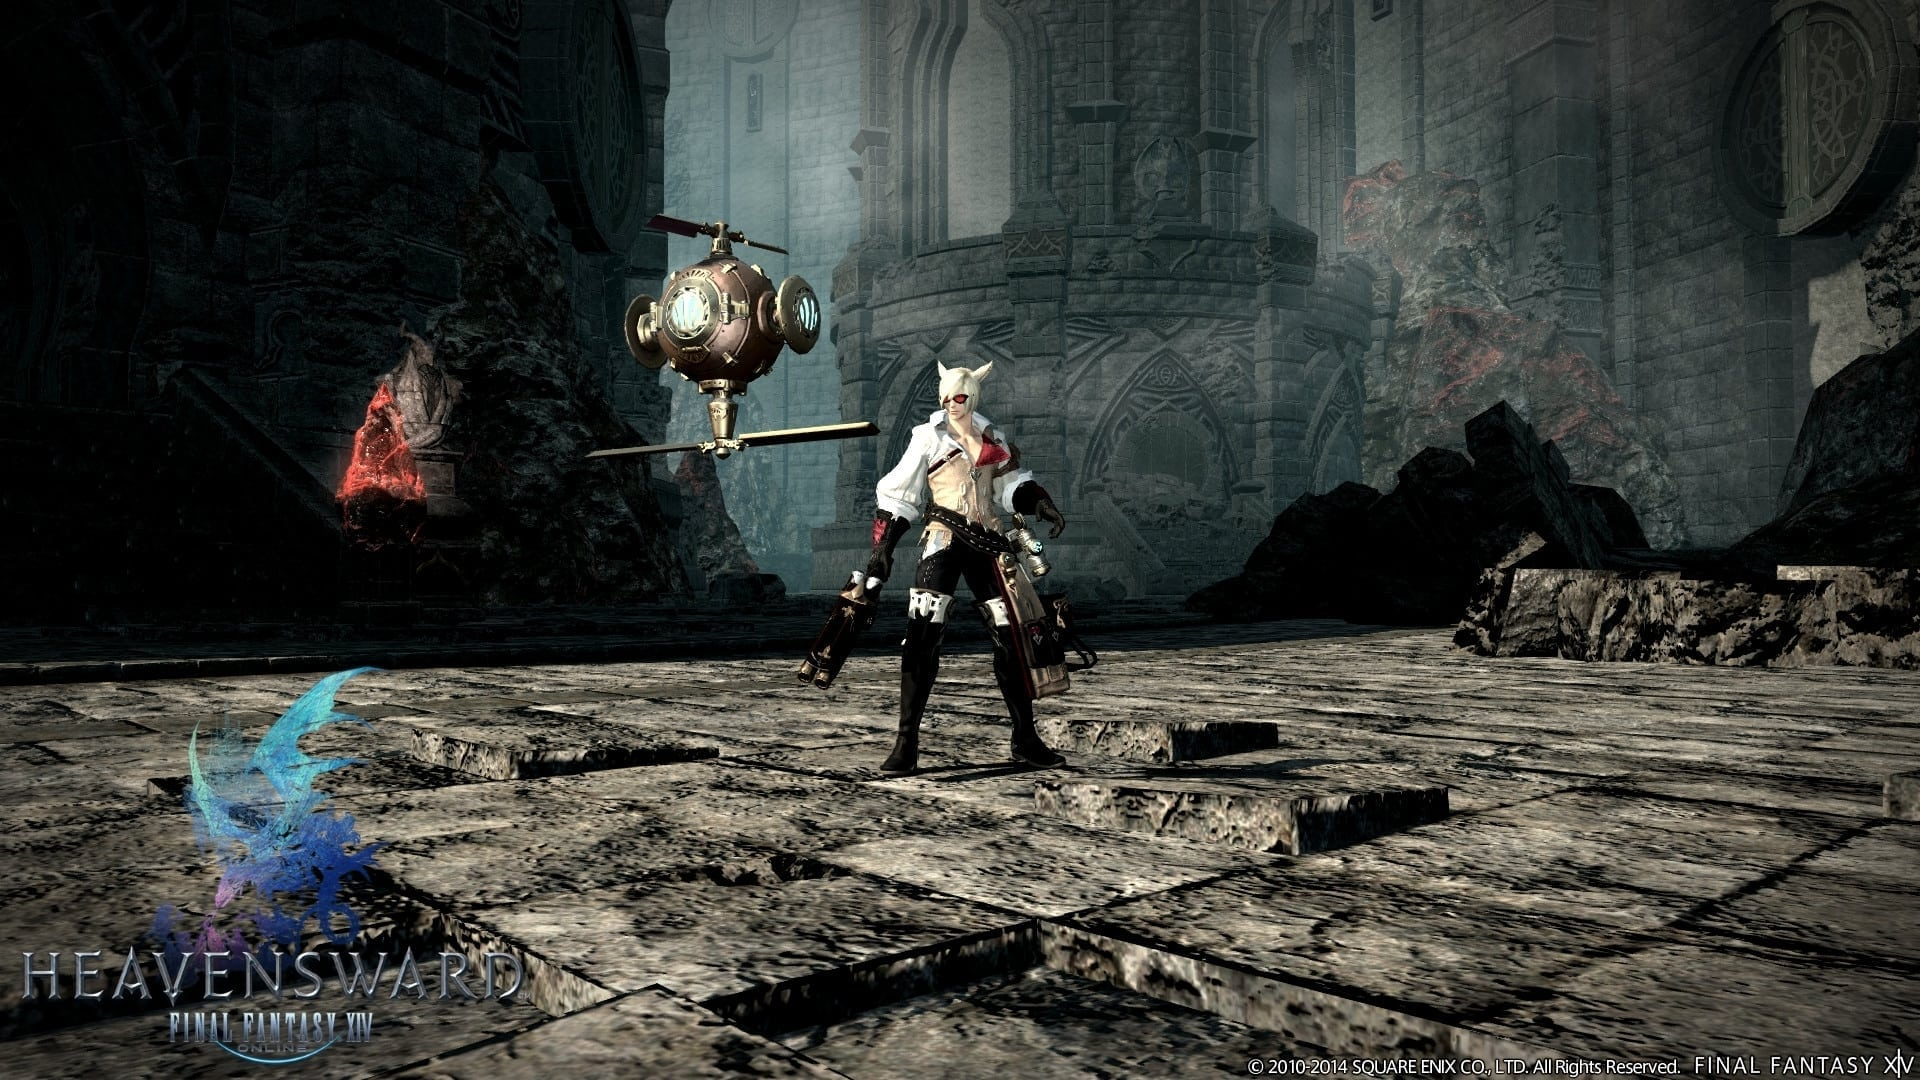 Final Fantasy XIV Heavensward - Machinist image 4